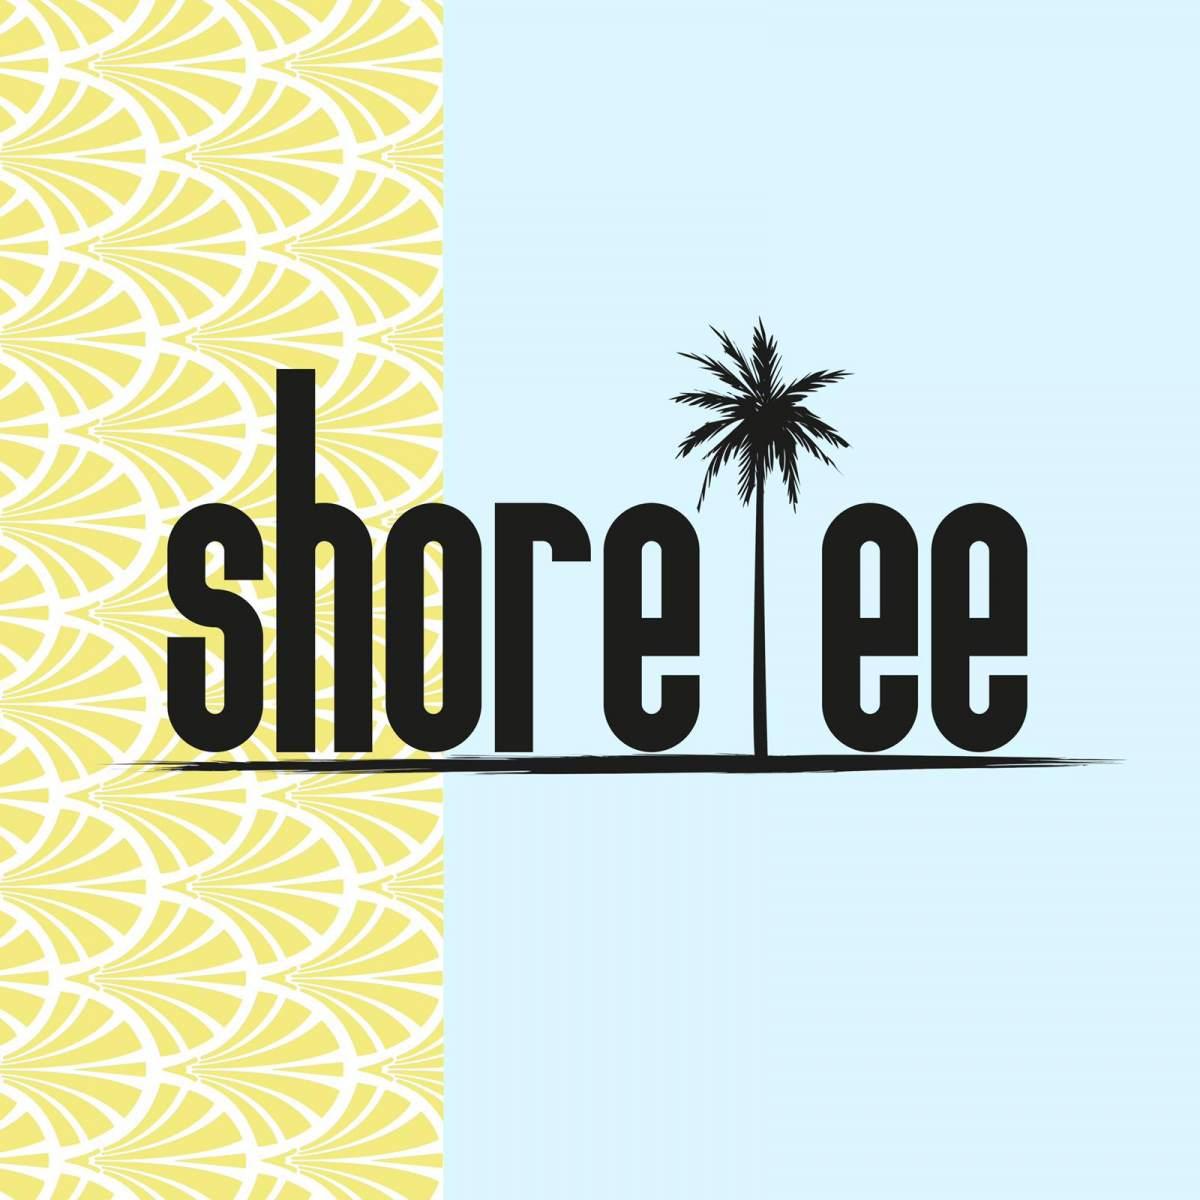 Shore-Tee